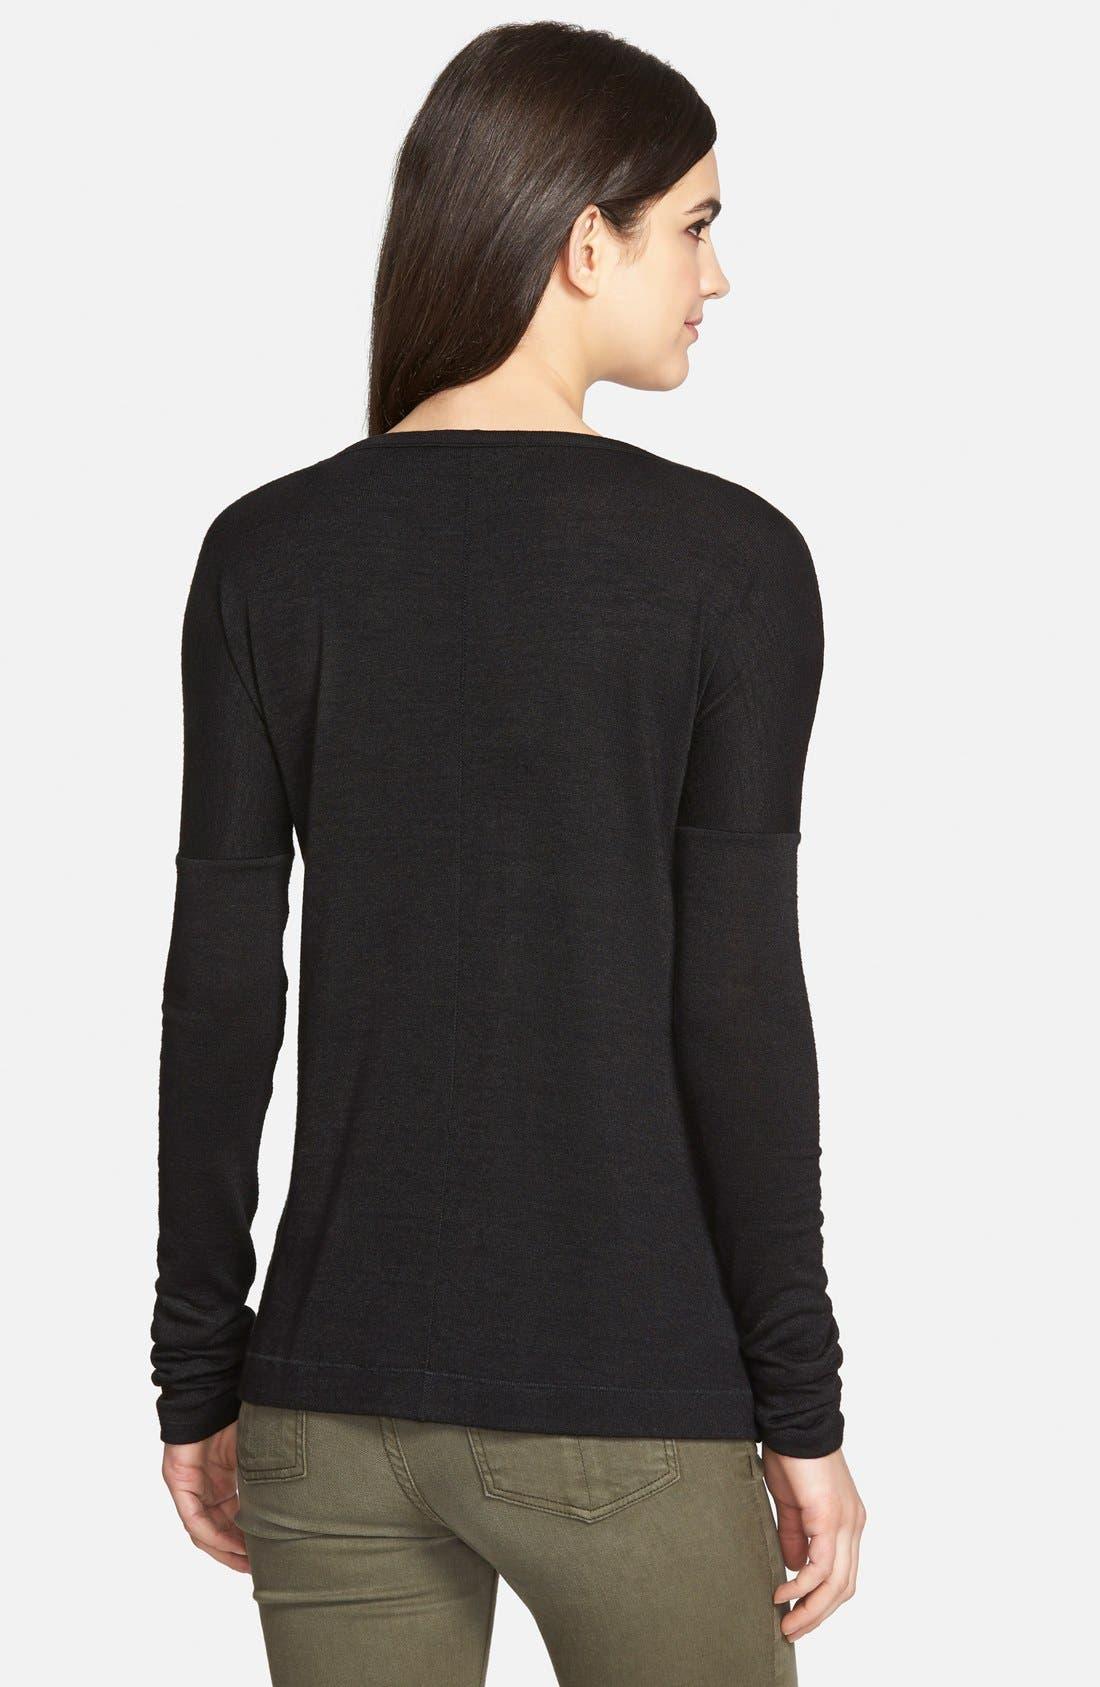 Alternate Image 2  - rag & bone/JEAN 'Theo' Long Sleeve V-Neck Pullover (Nordstrom Exclusive)